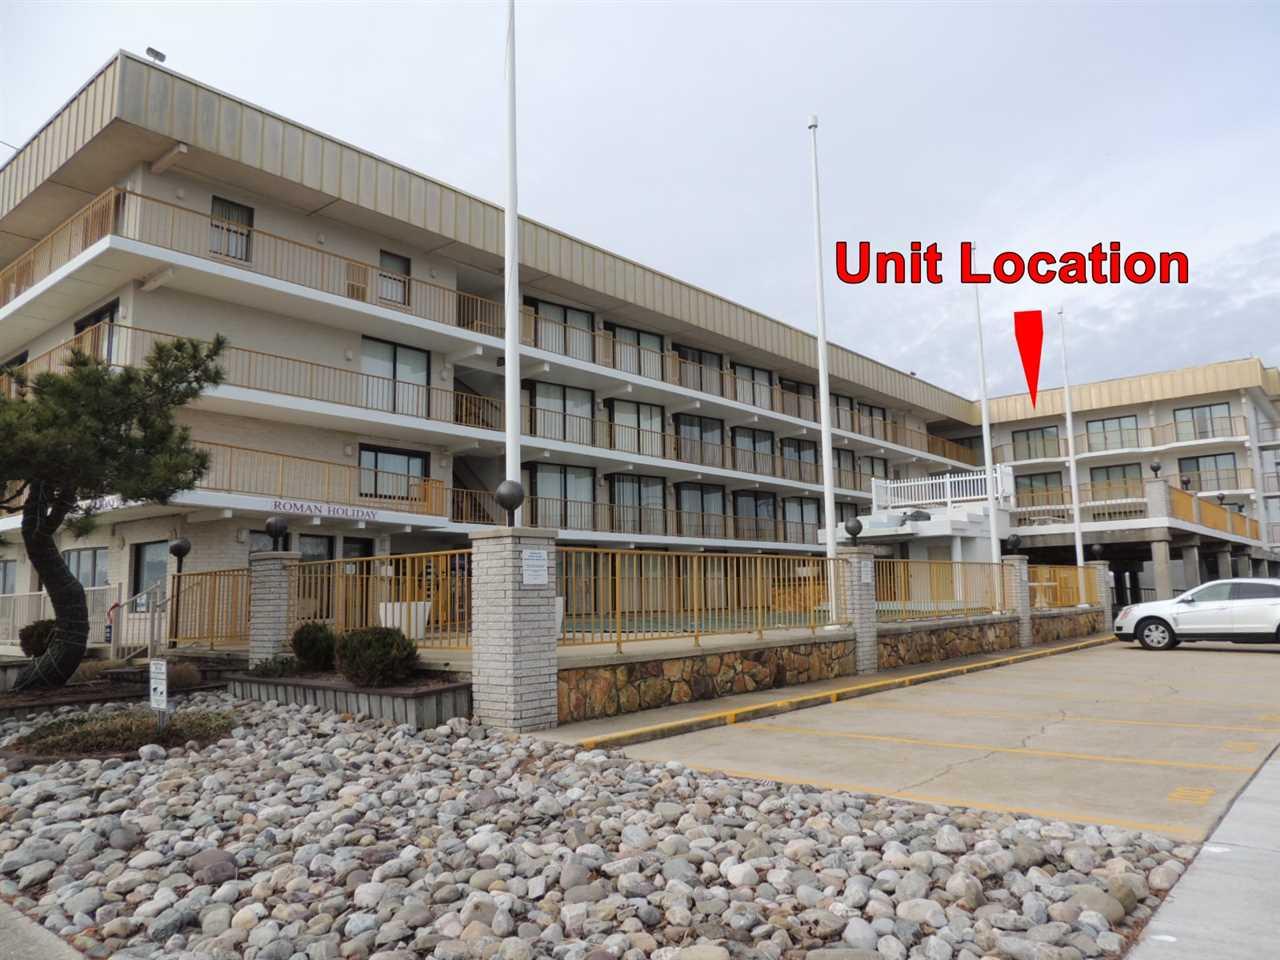 1000, Unit 413 Kennedy Drive, North Wildwood